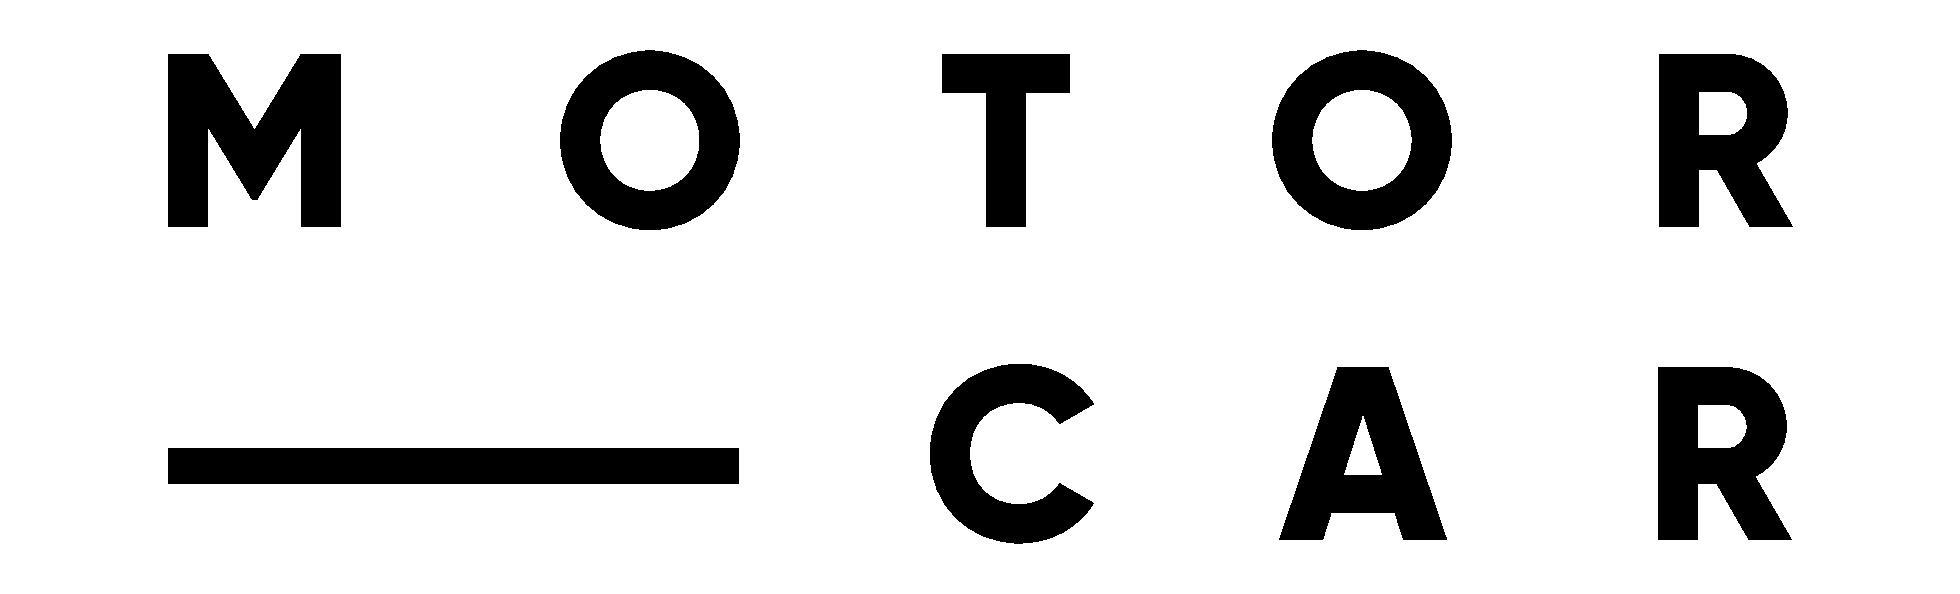 MotorCar_Logo_Black-page-001